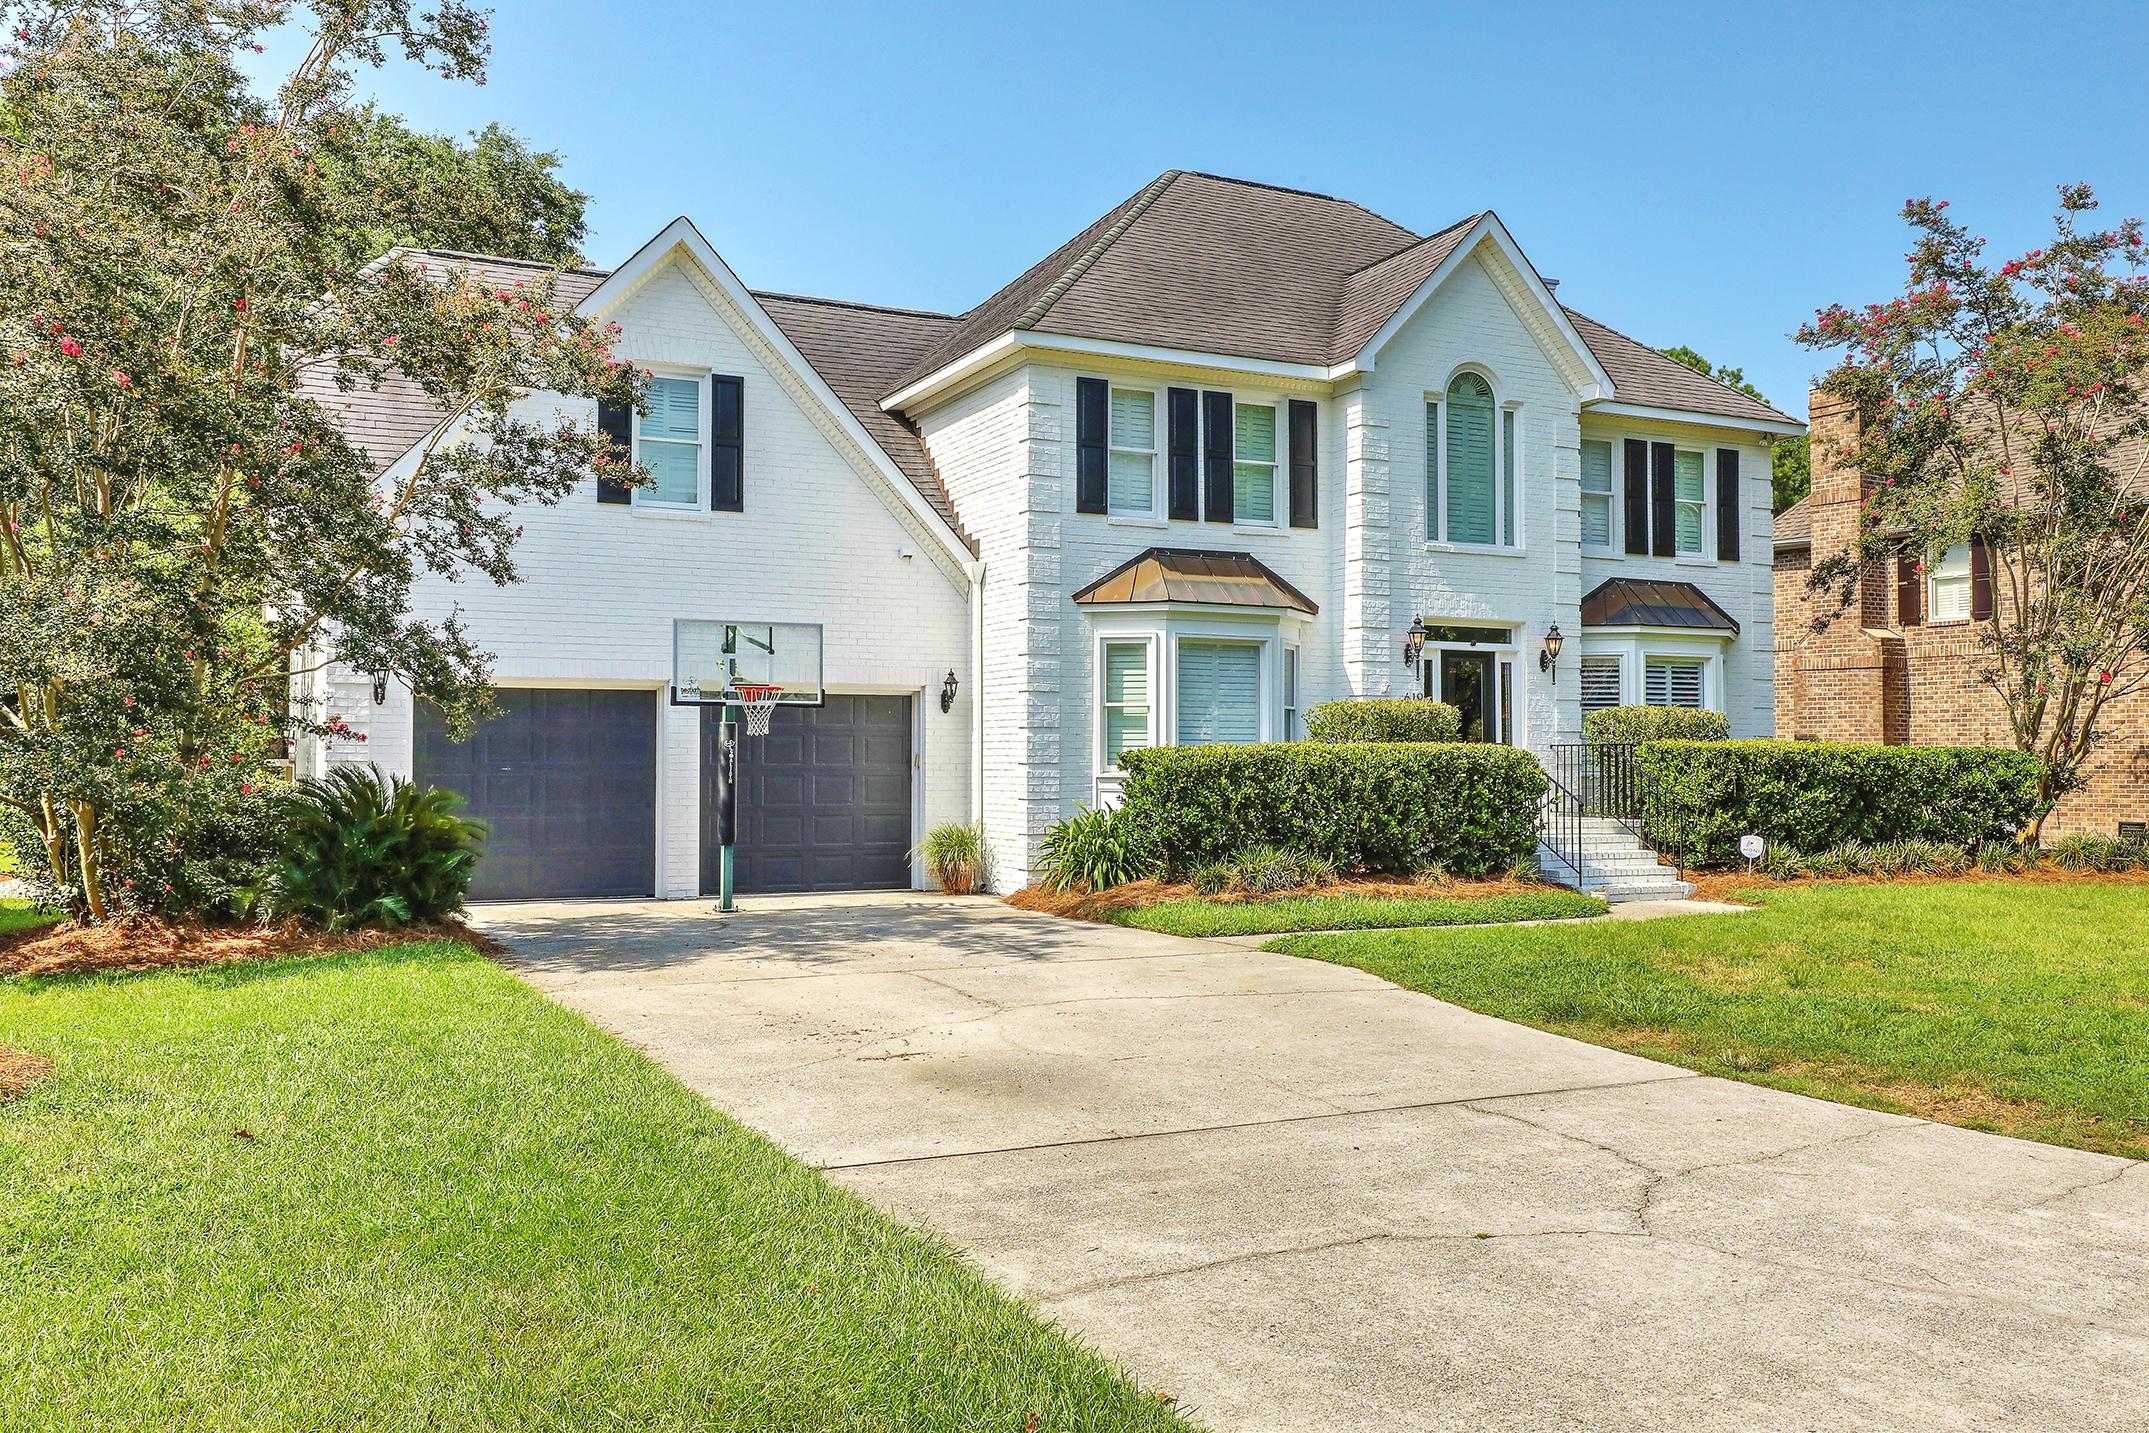 Hobcaw Creek Plantation Homes For Sale - 619 Palisades, Mount Pleasant, SC - 0